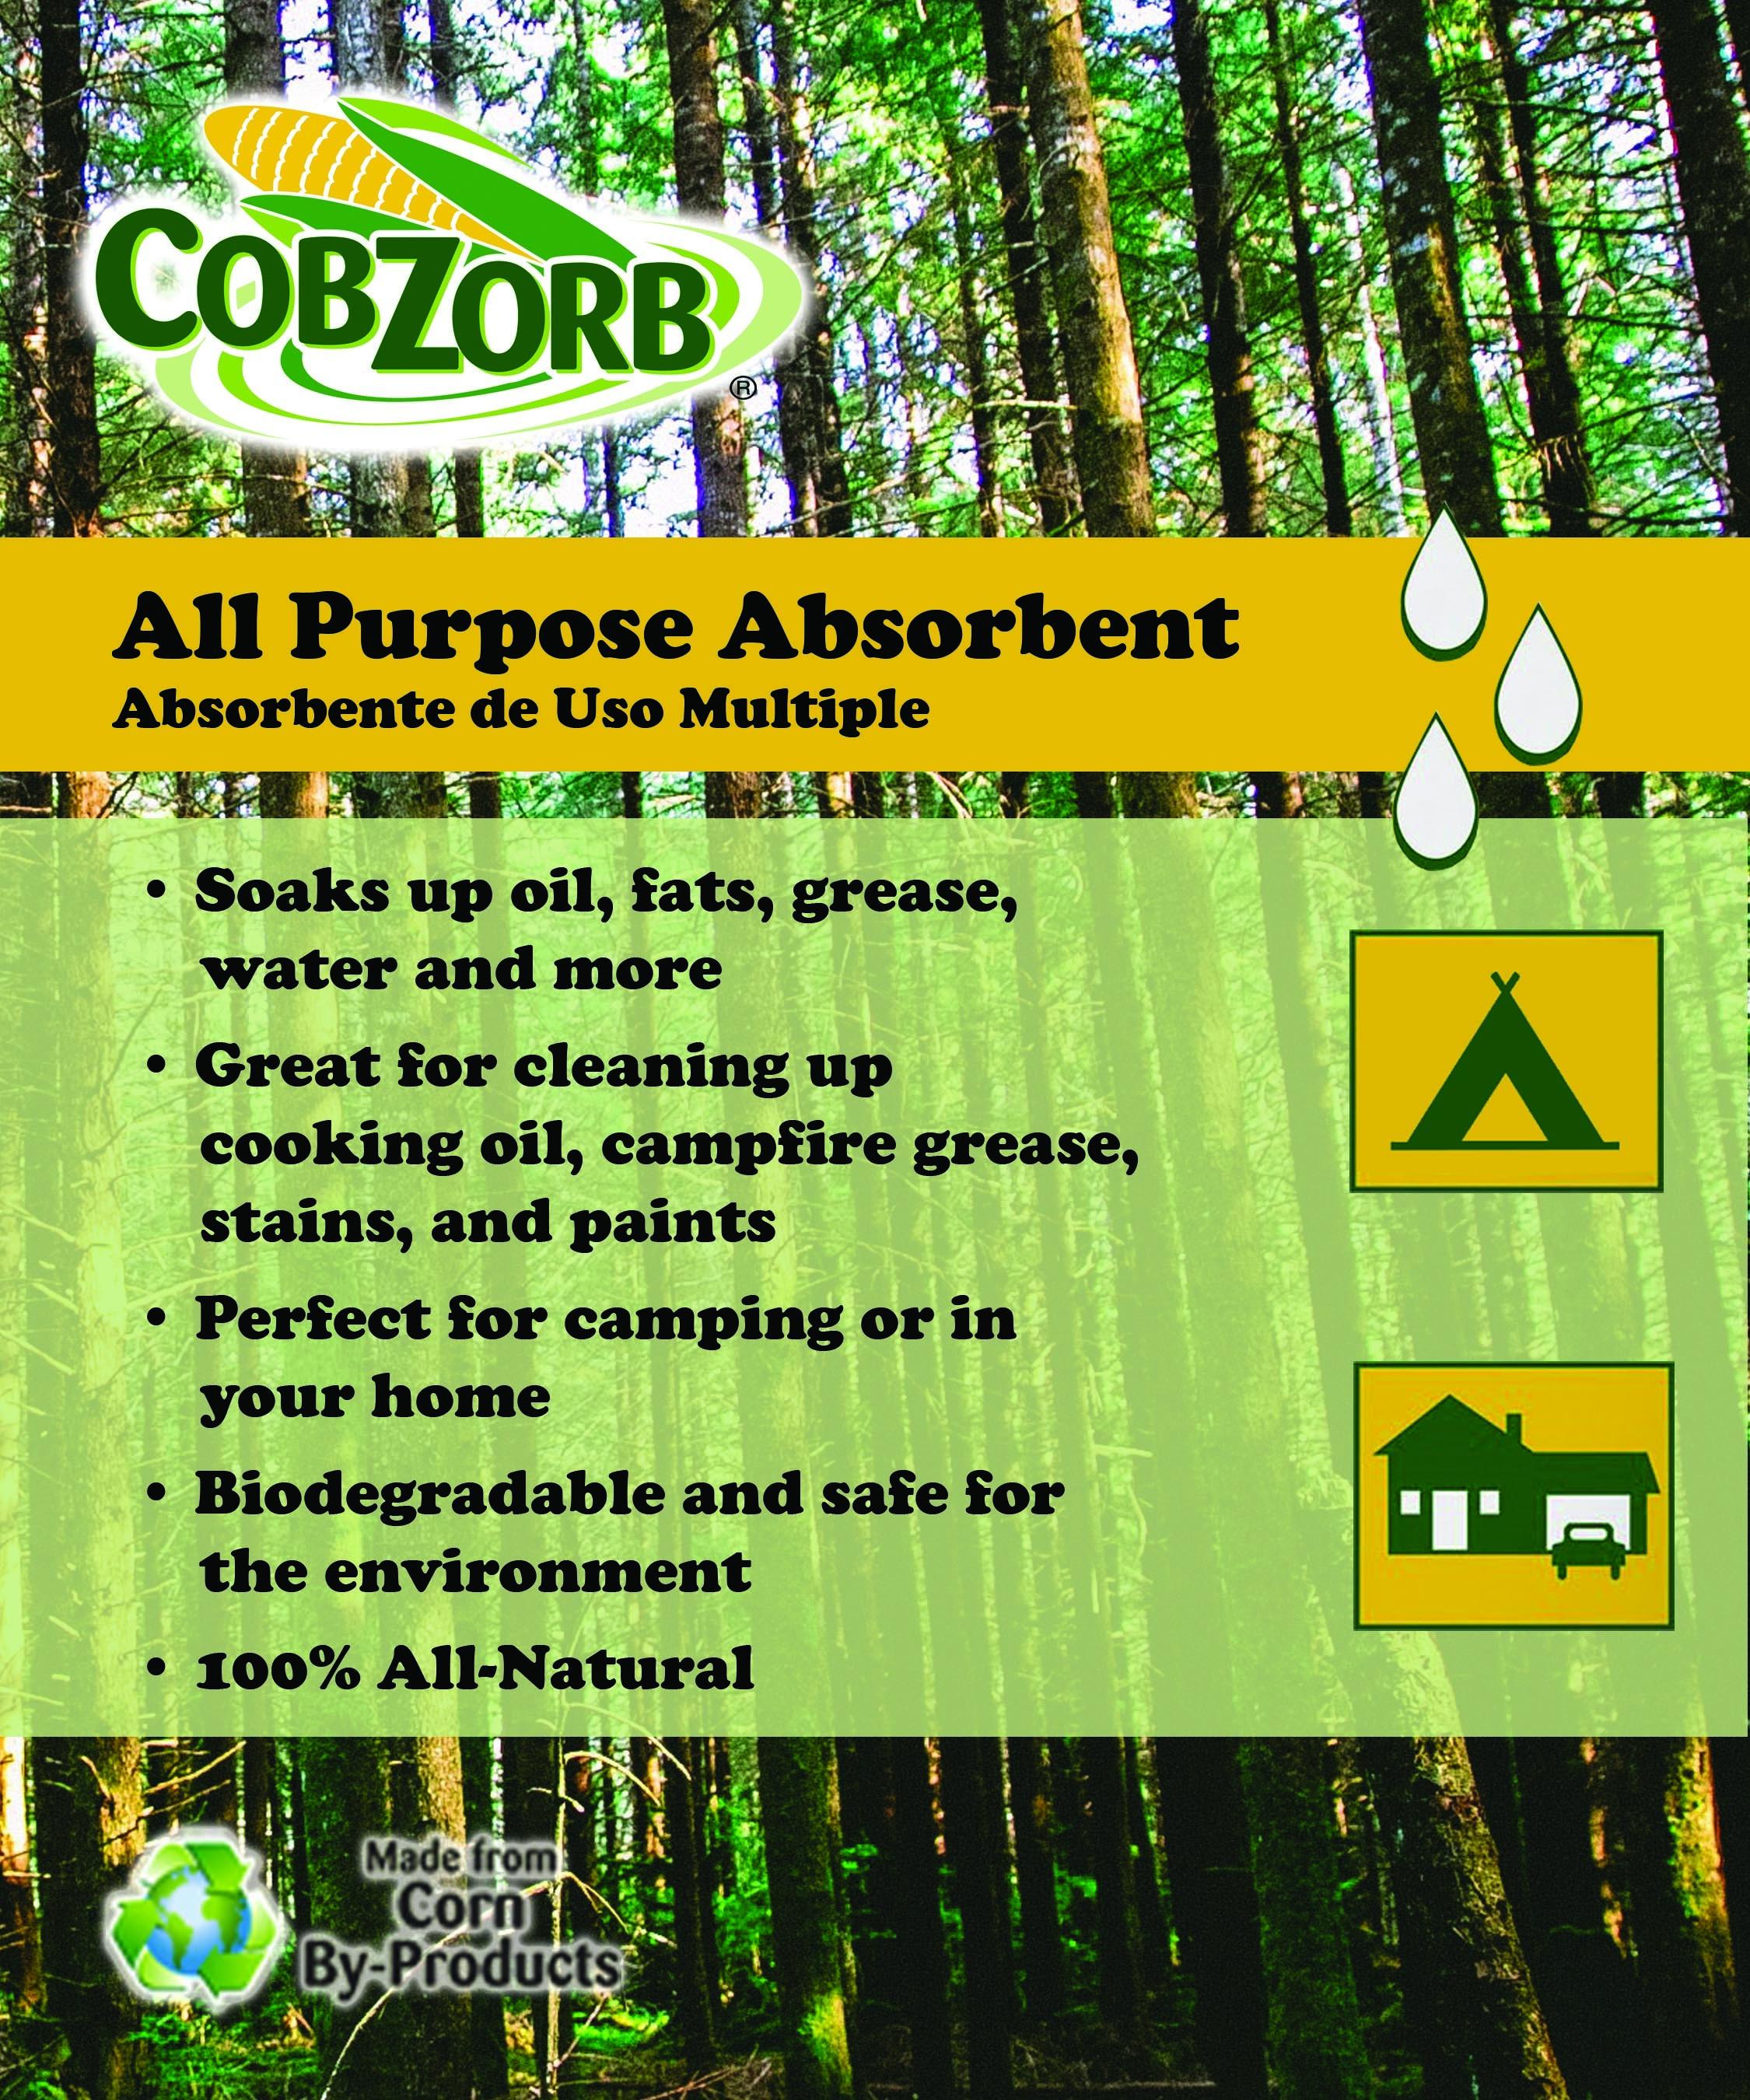 CobZorb® All Purpose Absorbent